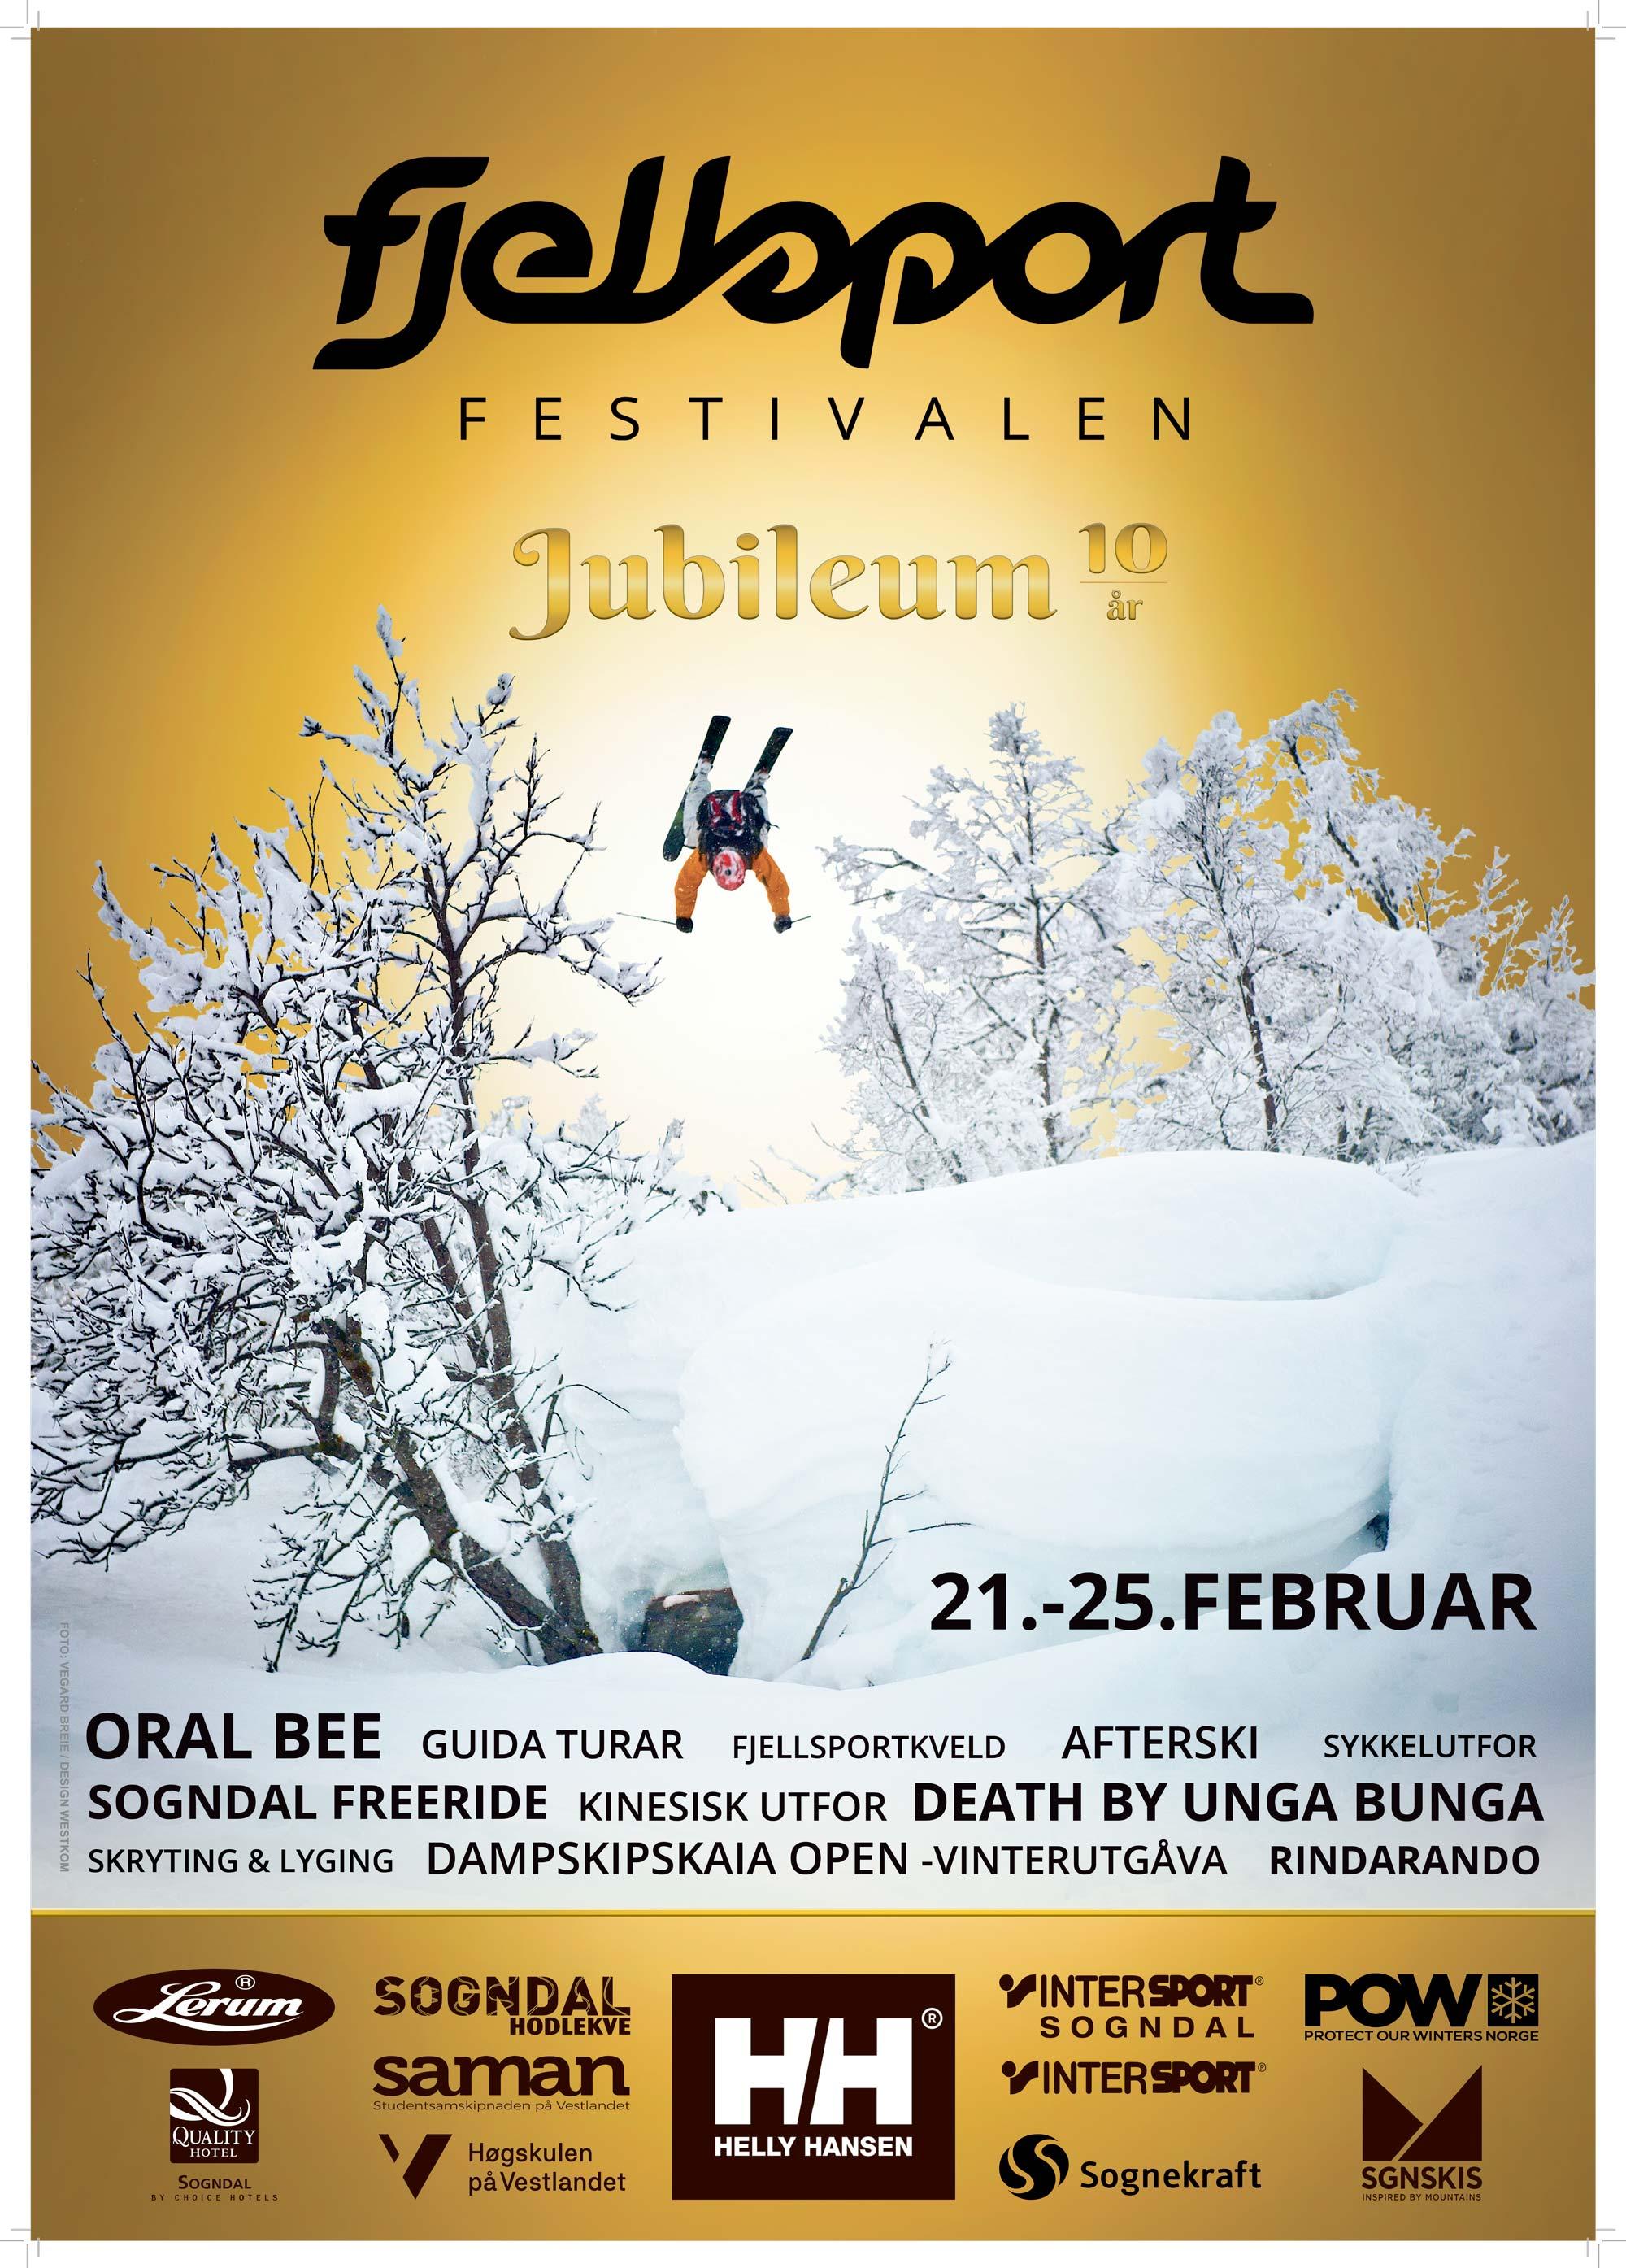 Fjellsportfestivalen_Jubileum_a2_3mmbl.jpg